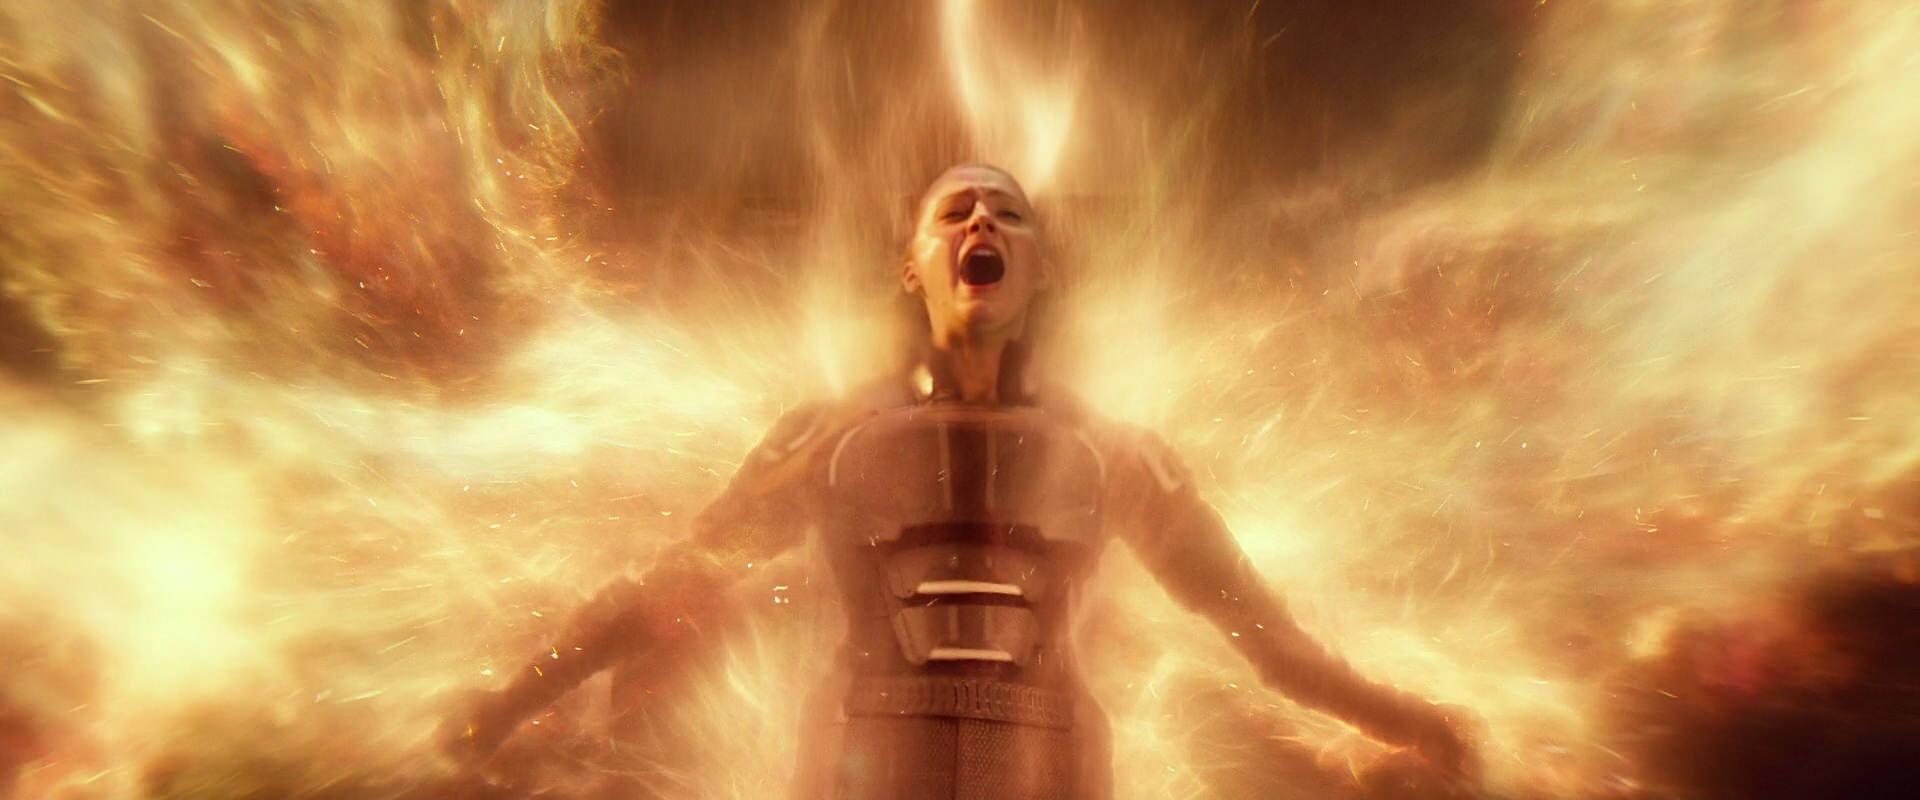 Sophie Turner as Jean Grey in X-Men: Apocalypse.